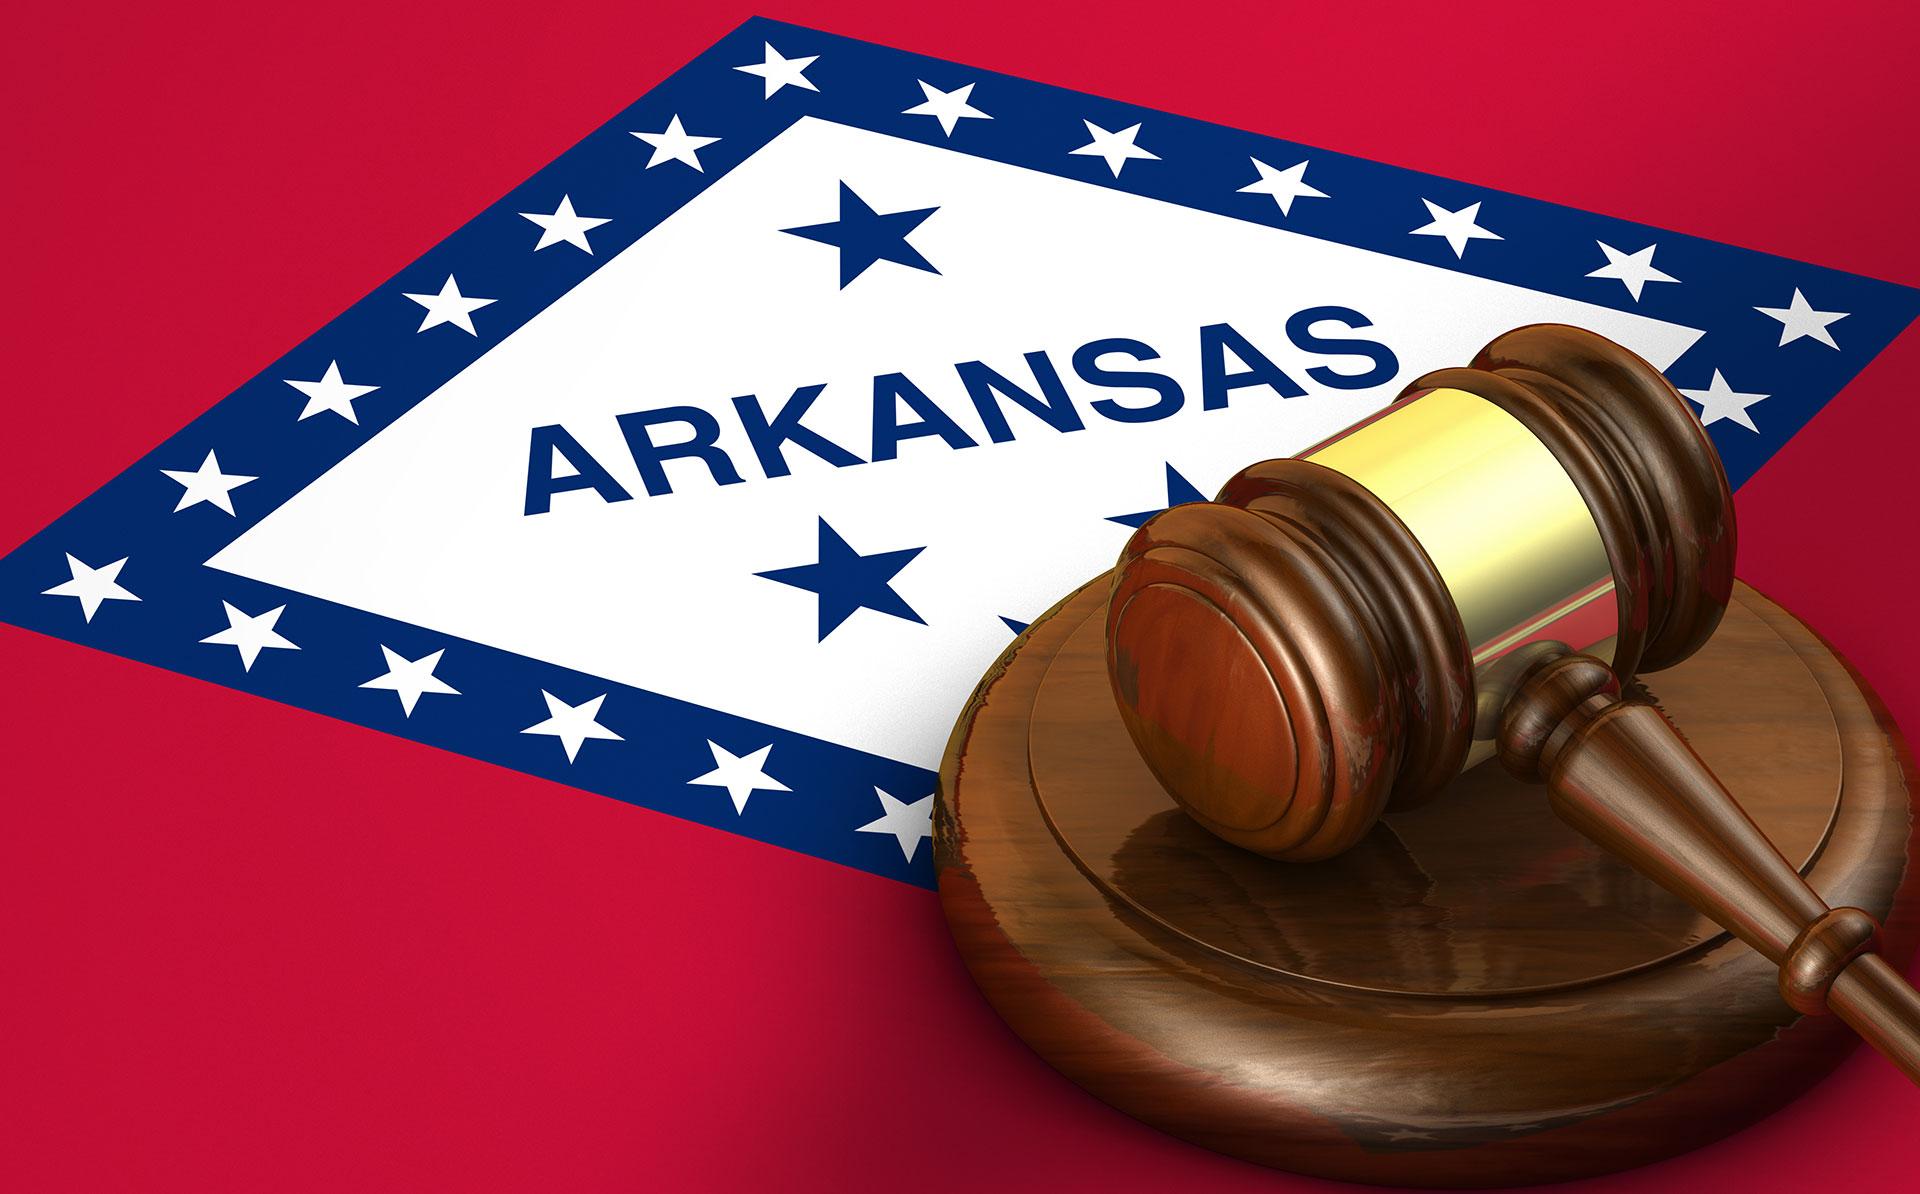 Local Pro Bono Arkansas Motor Vehicle Attorneys